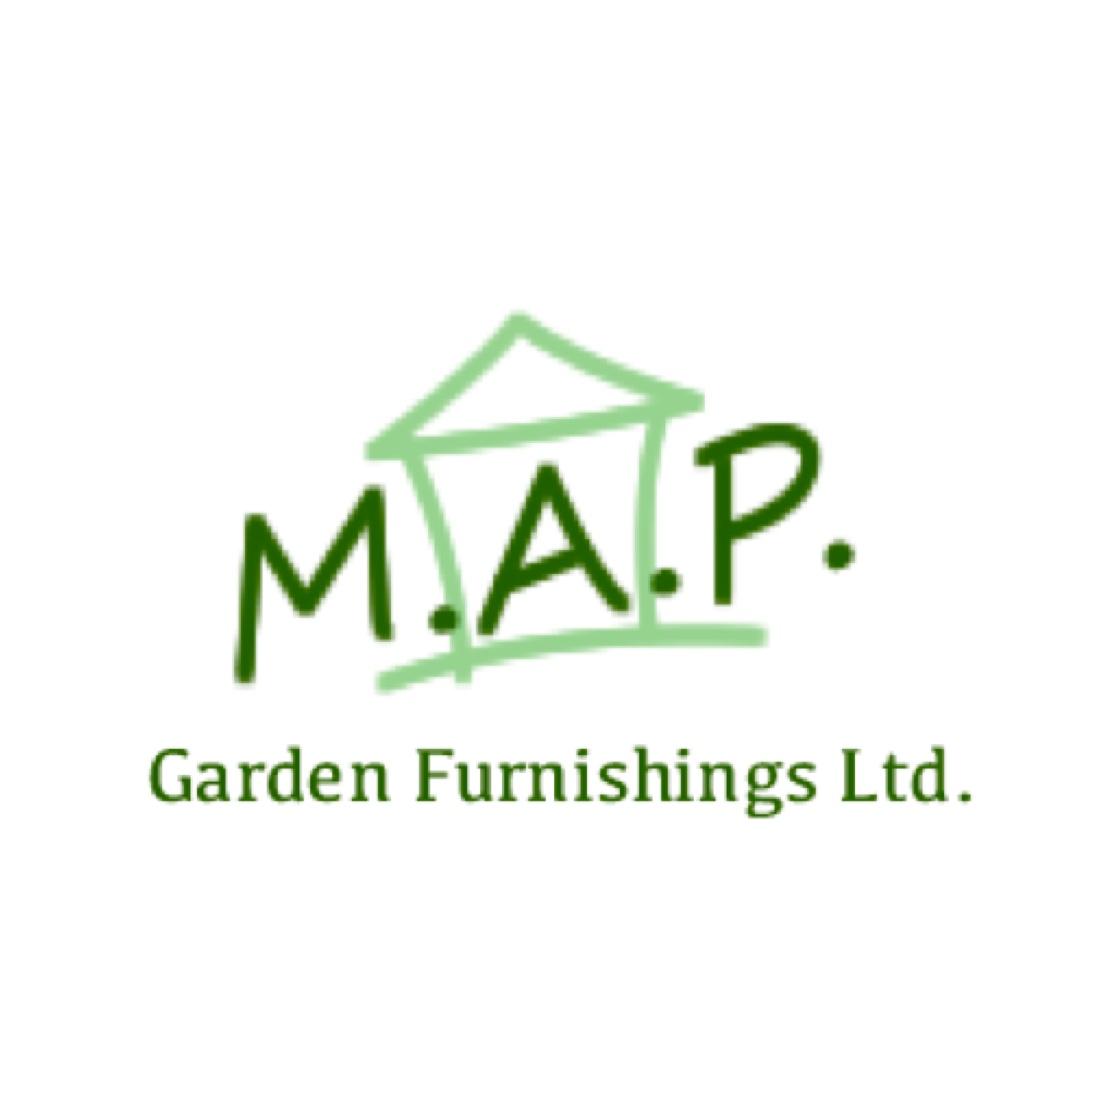 Protek Royal Exterior Natural Stain - Antique Teak (5 litre)